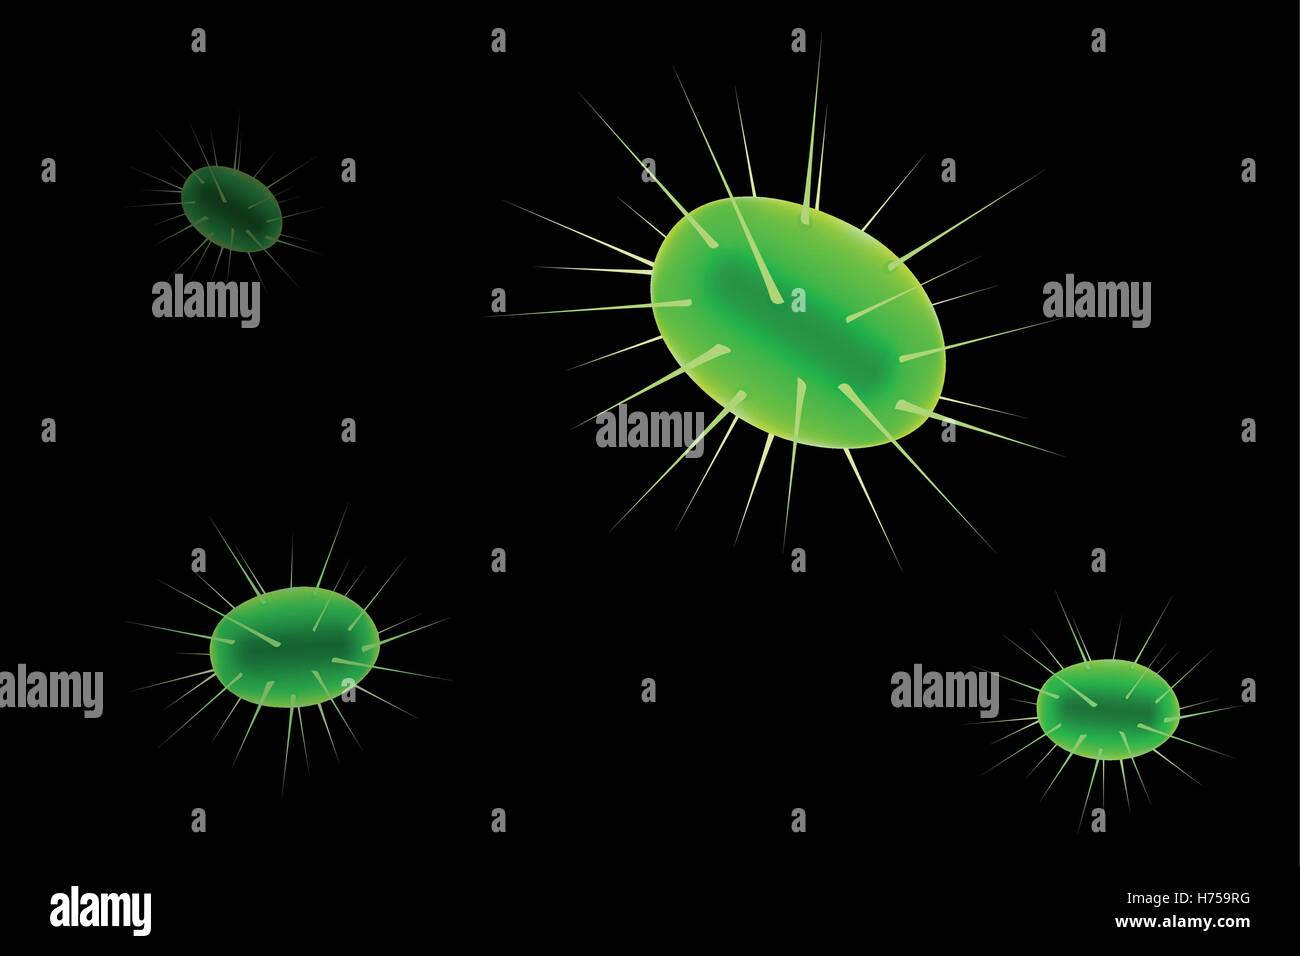 bacteria, bacteria background, virus, virus background, - Stock Image